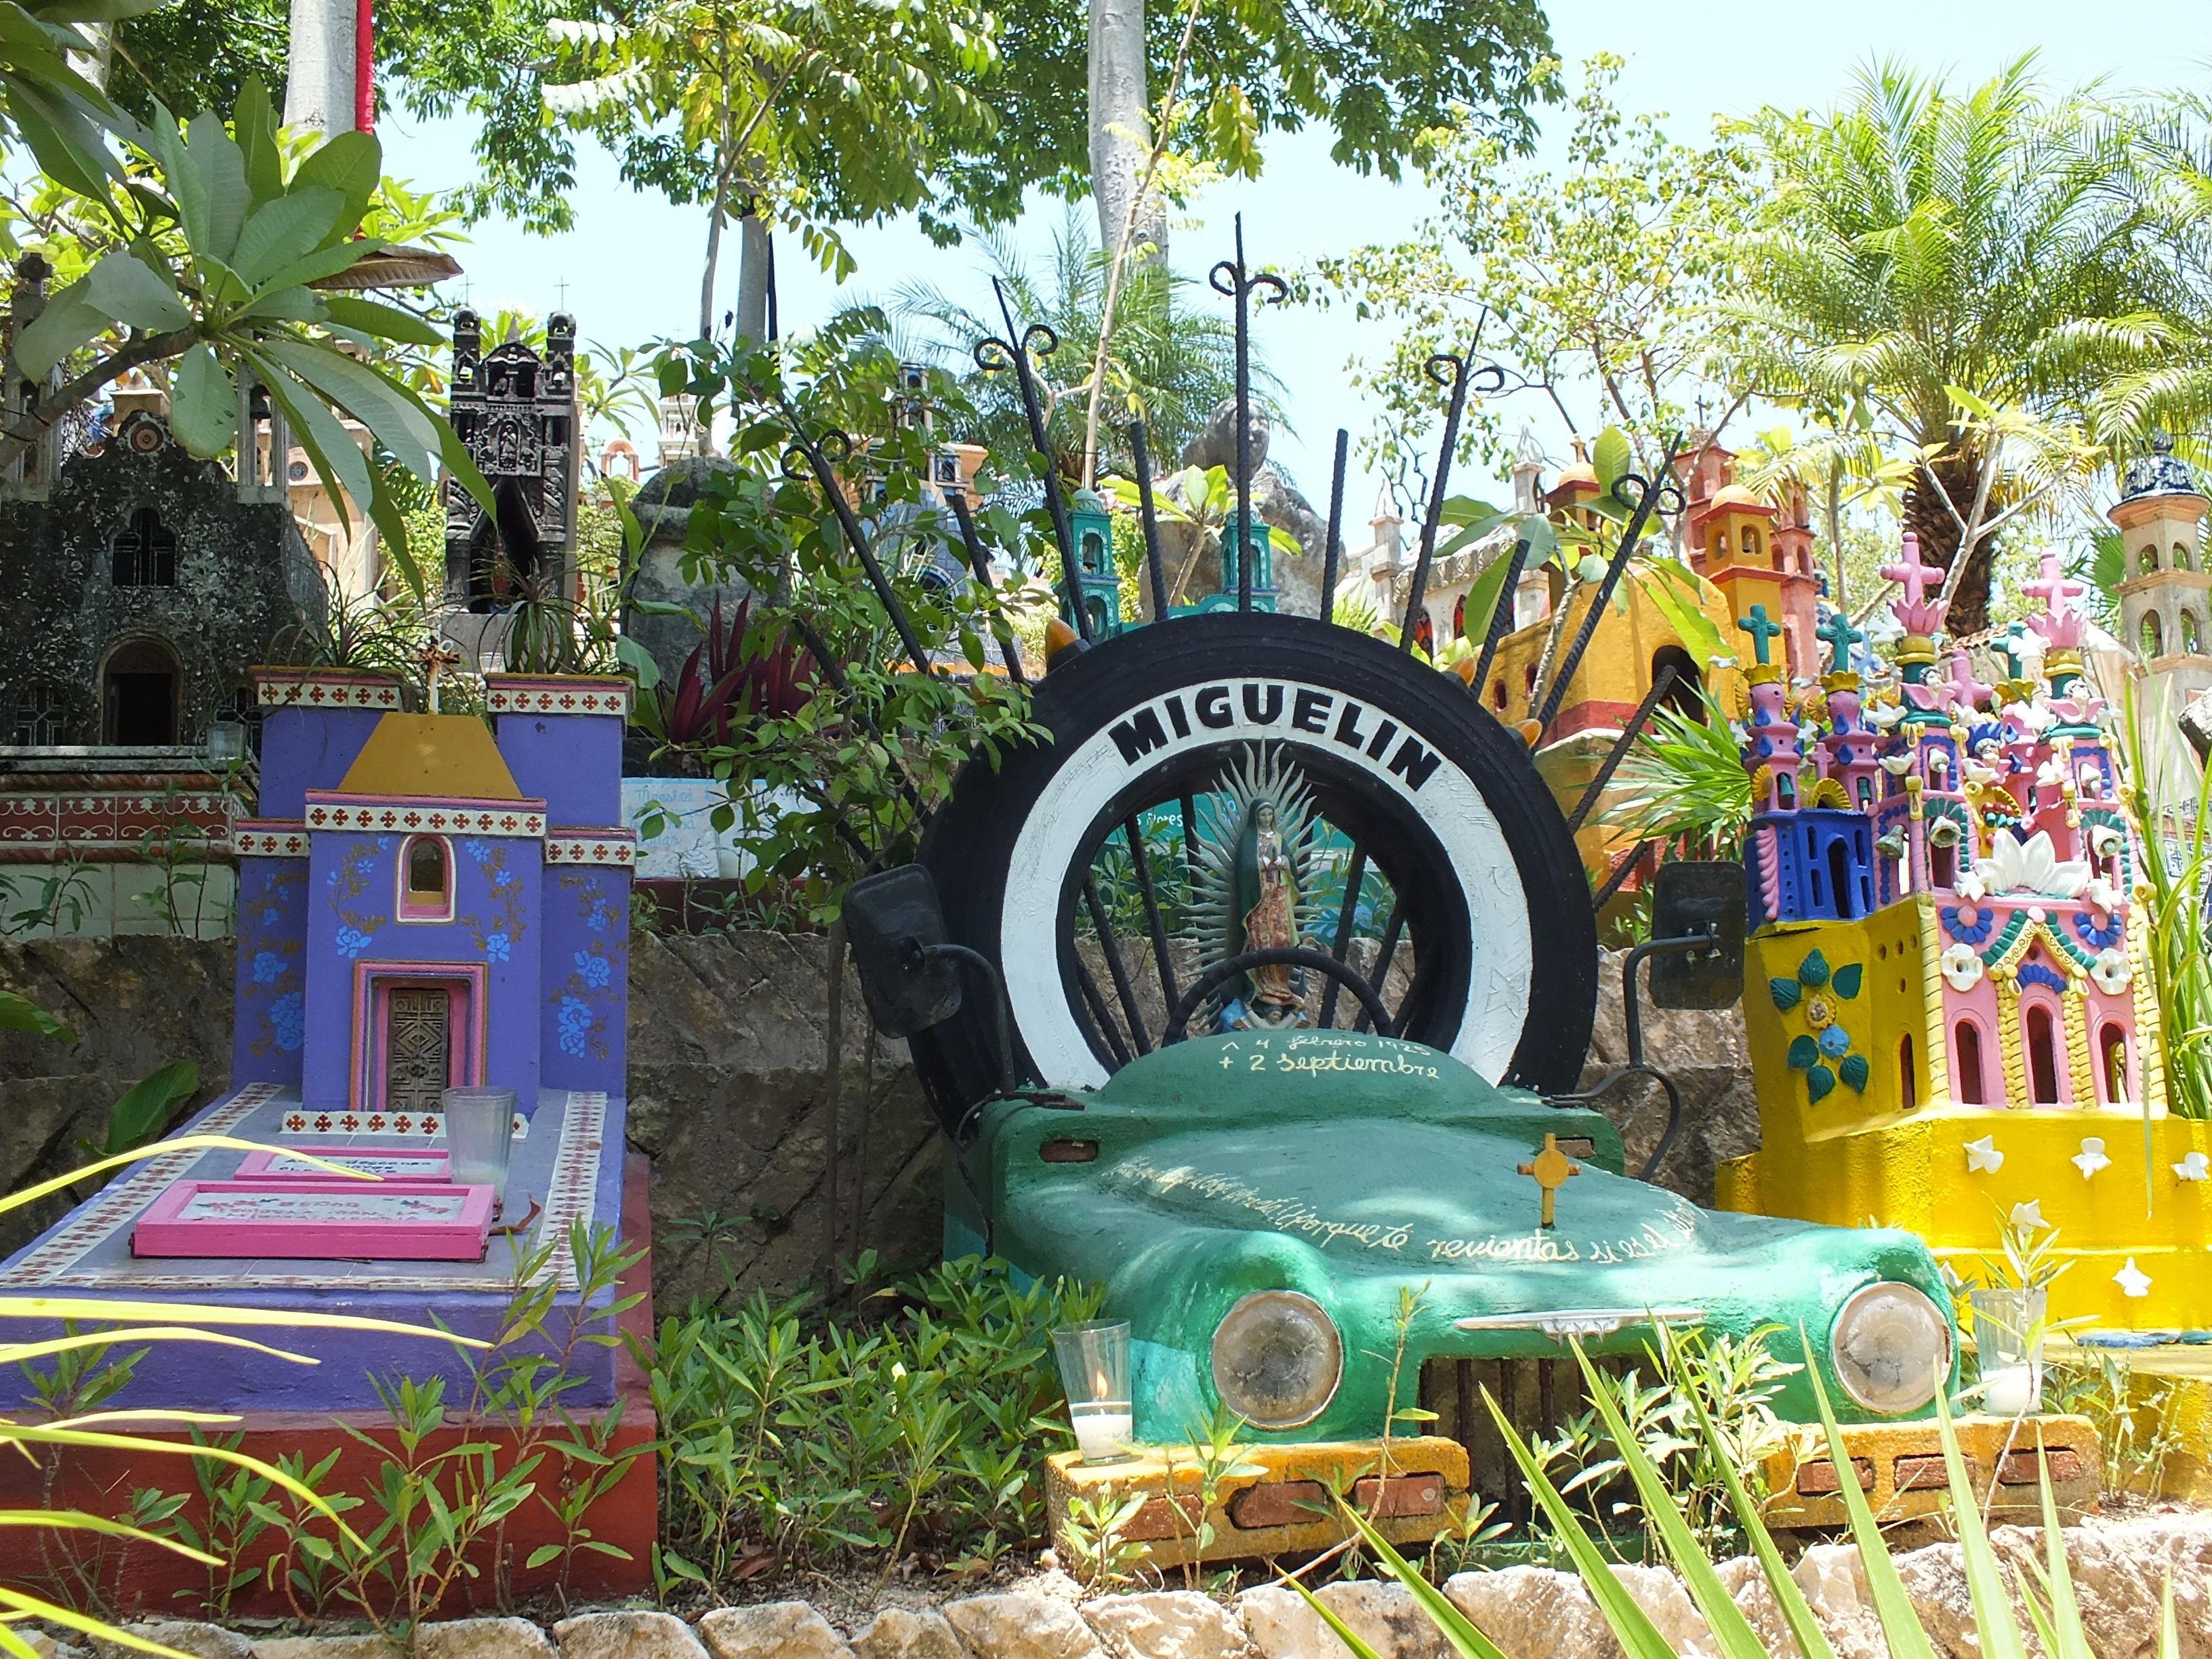 Free Images : car, jungle, amusement park, cemetery, resort